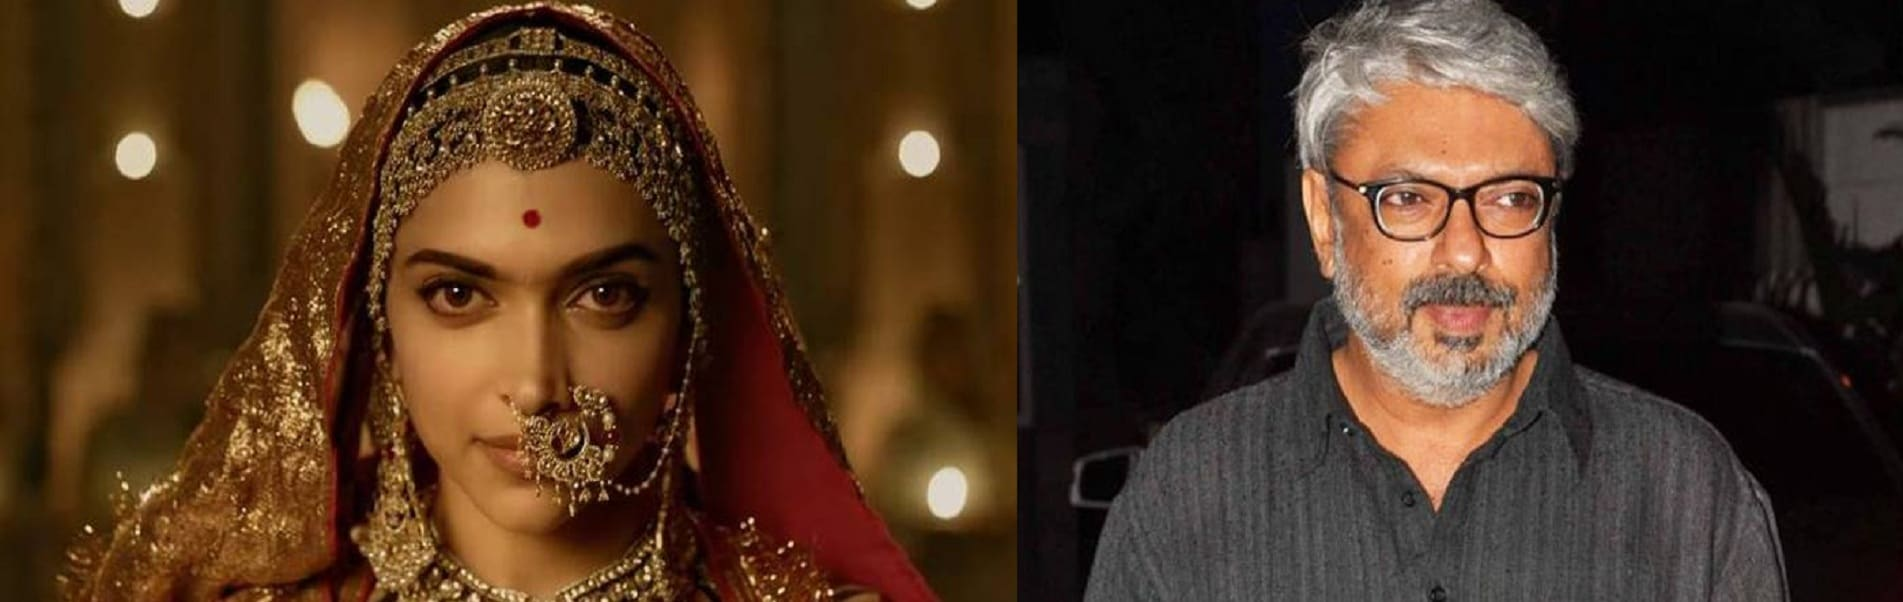 Padmavati controversy: Drama around Bhansali's film is about blatant murder of democracy